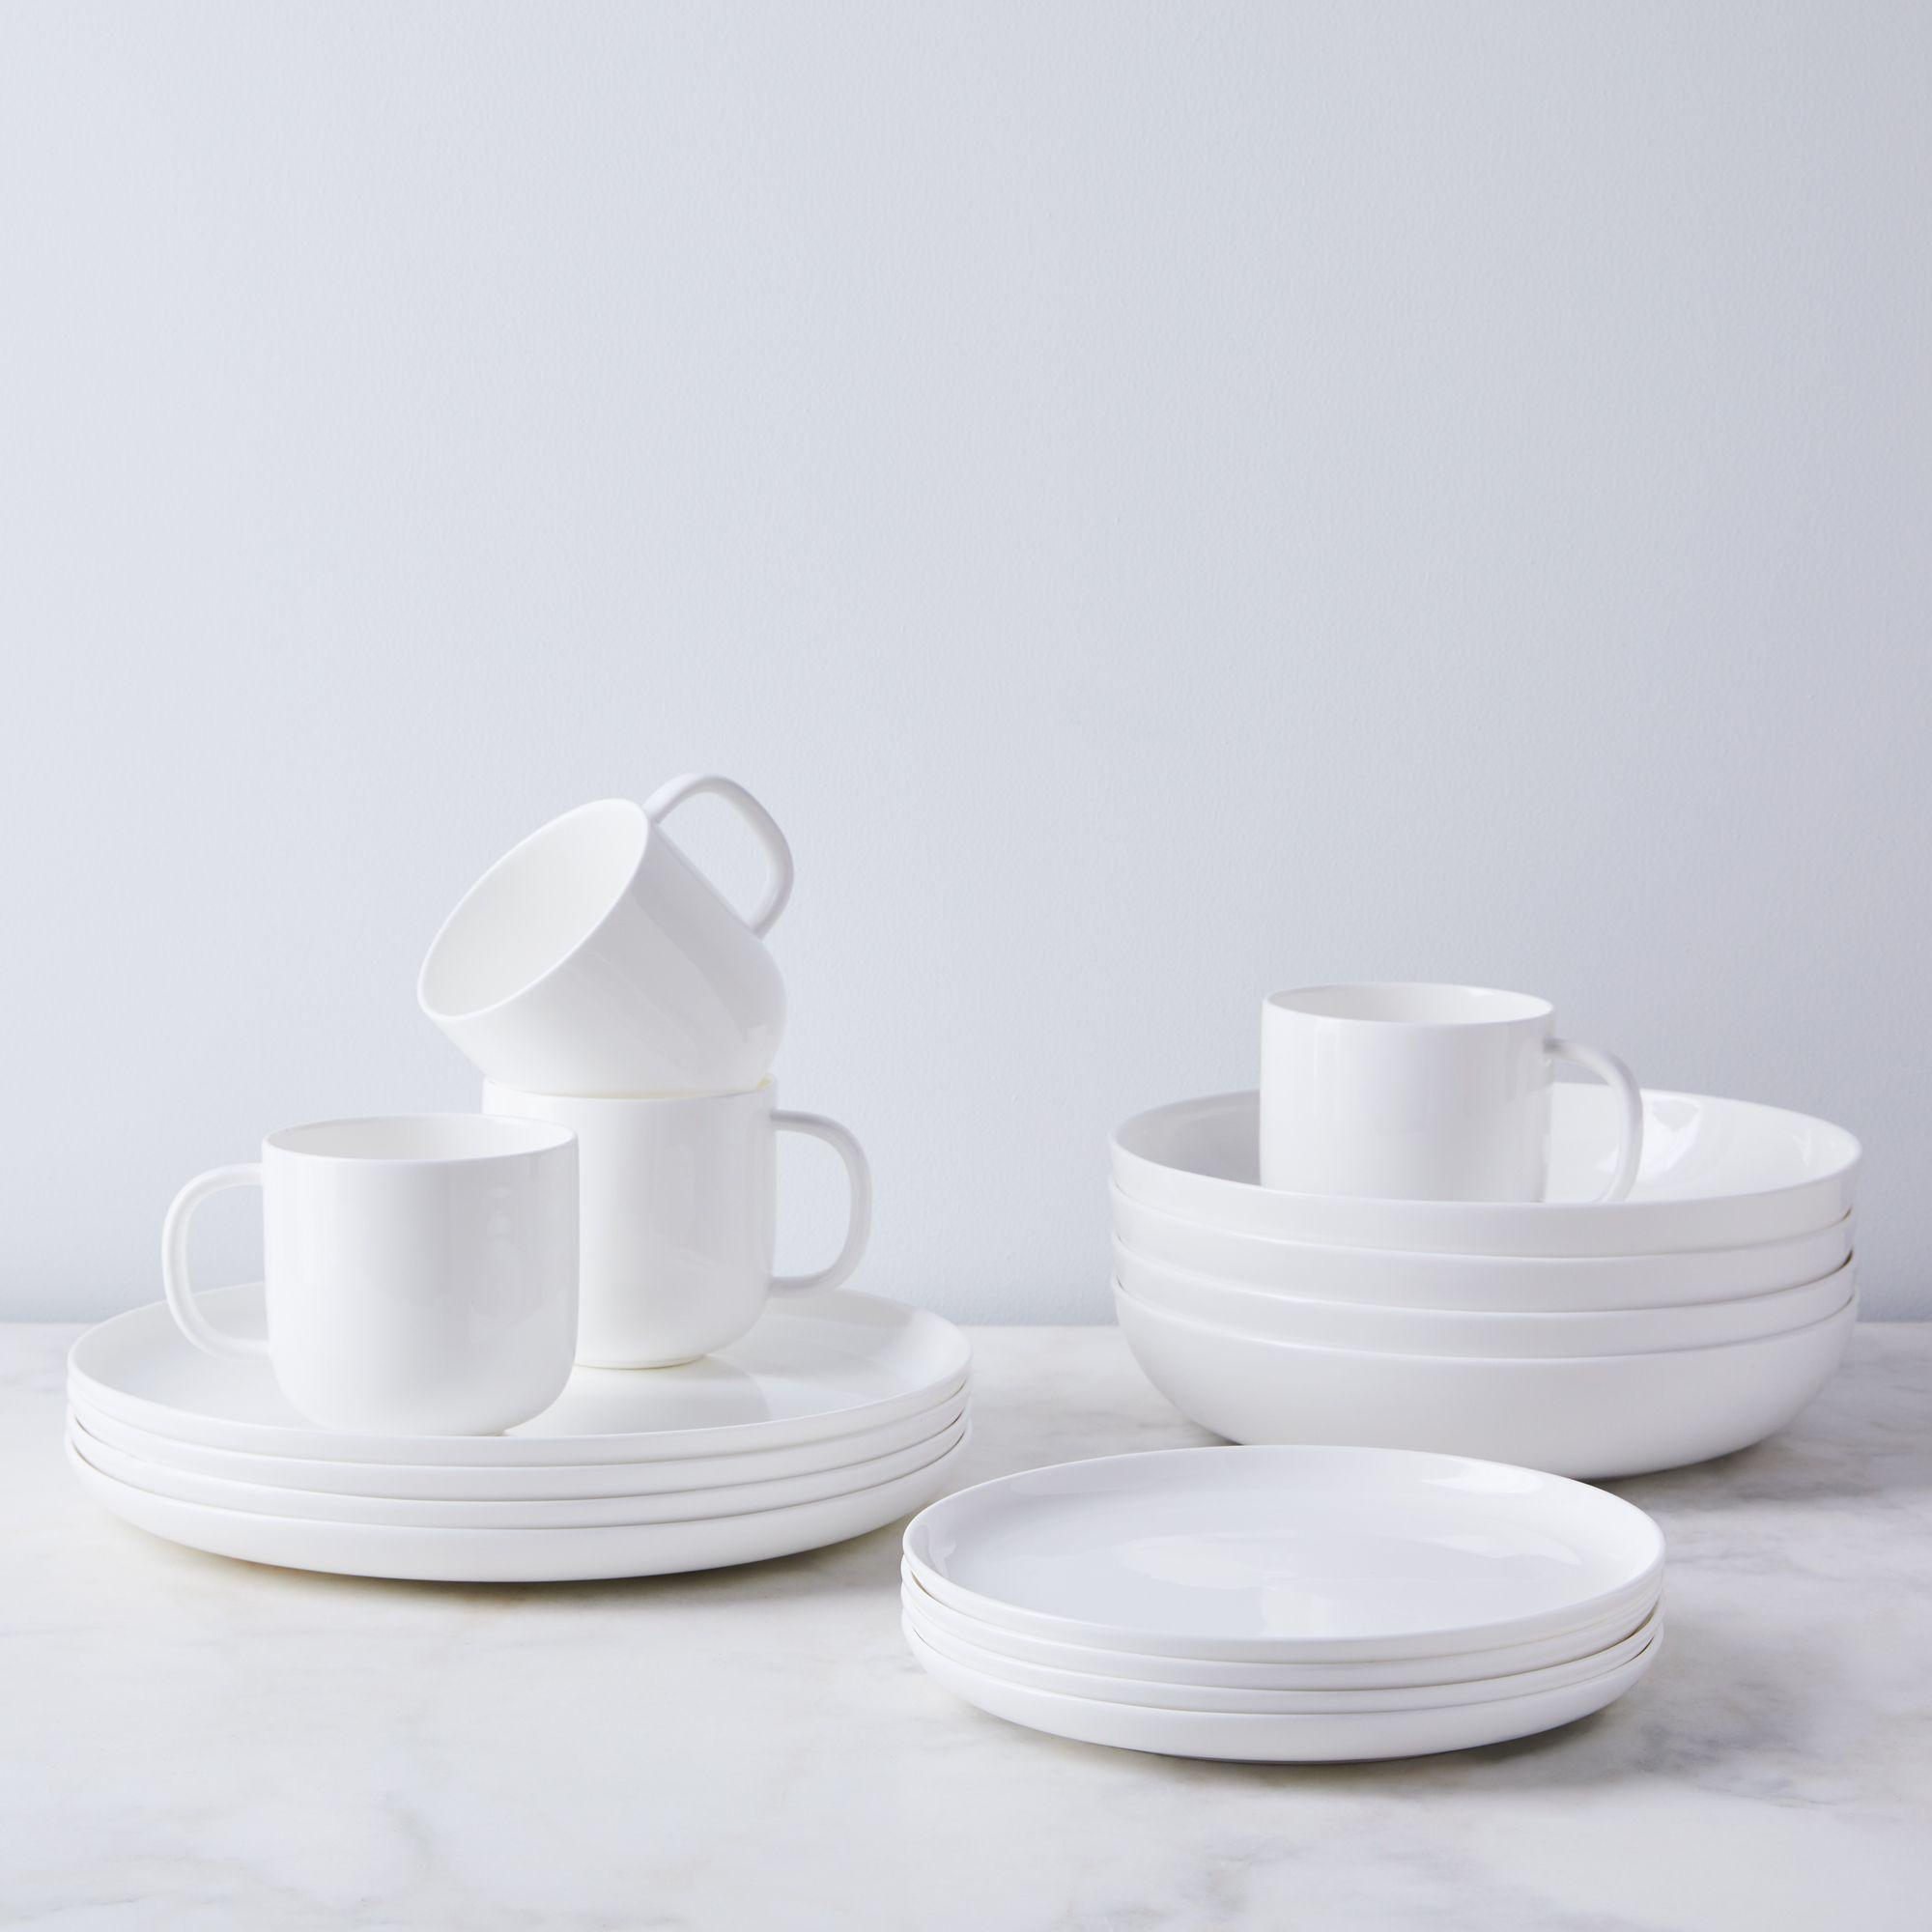 Kitchen Blanc by Yoojung Jang